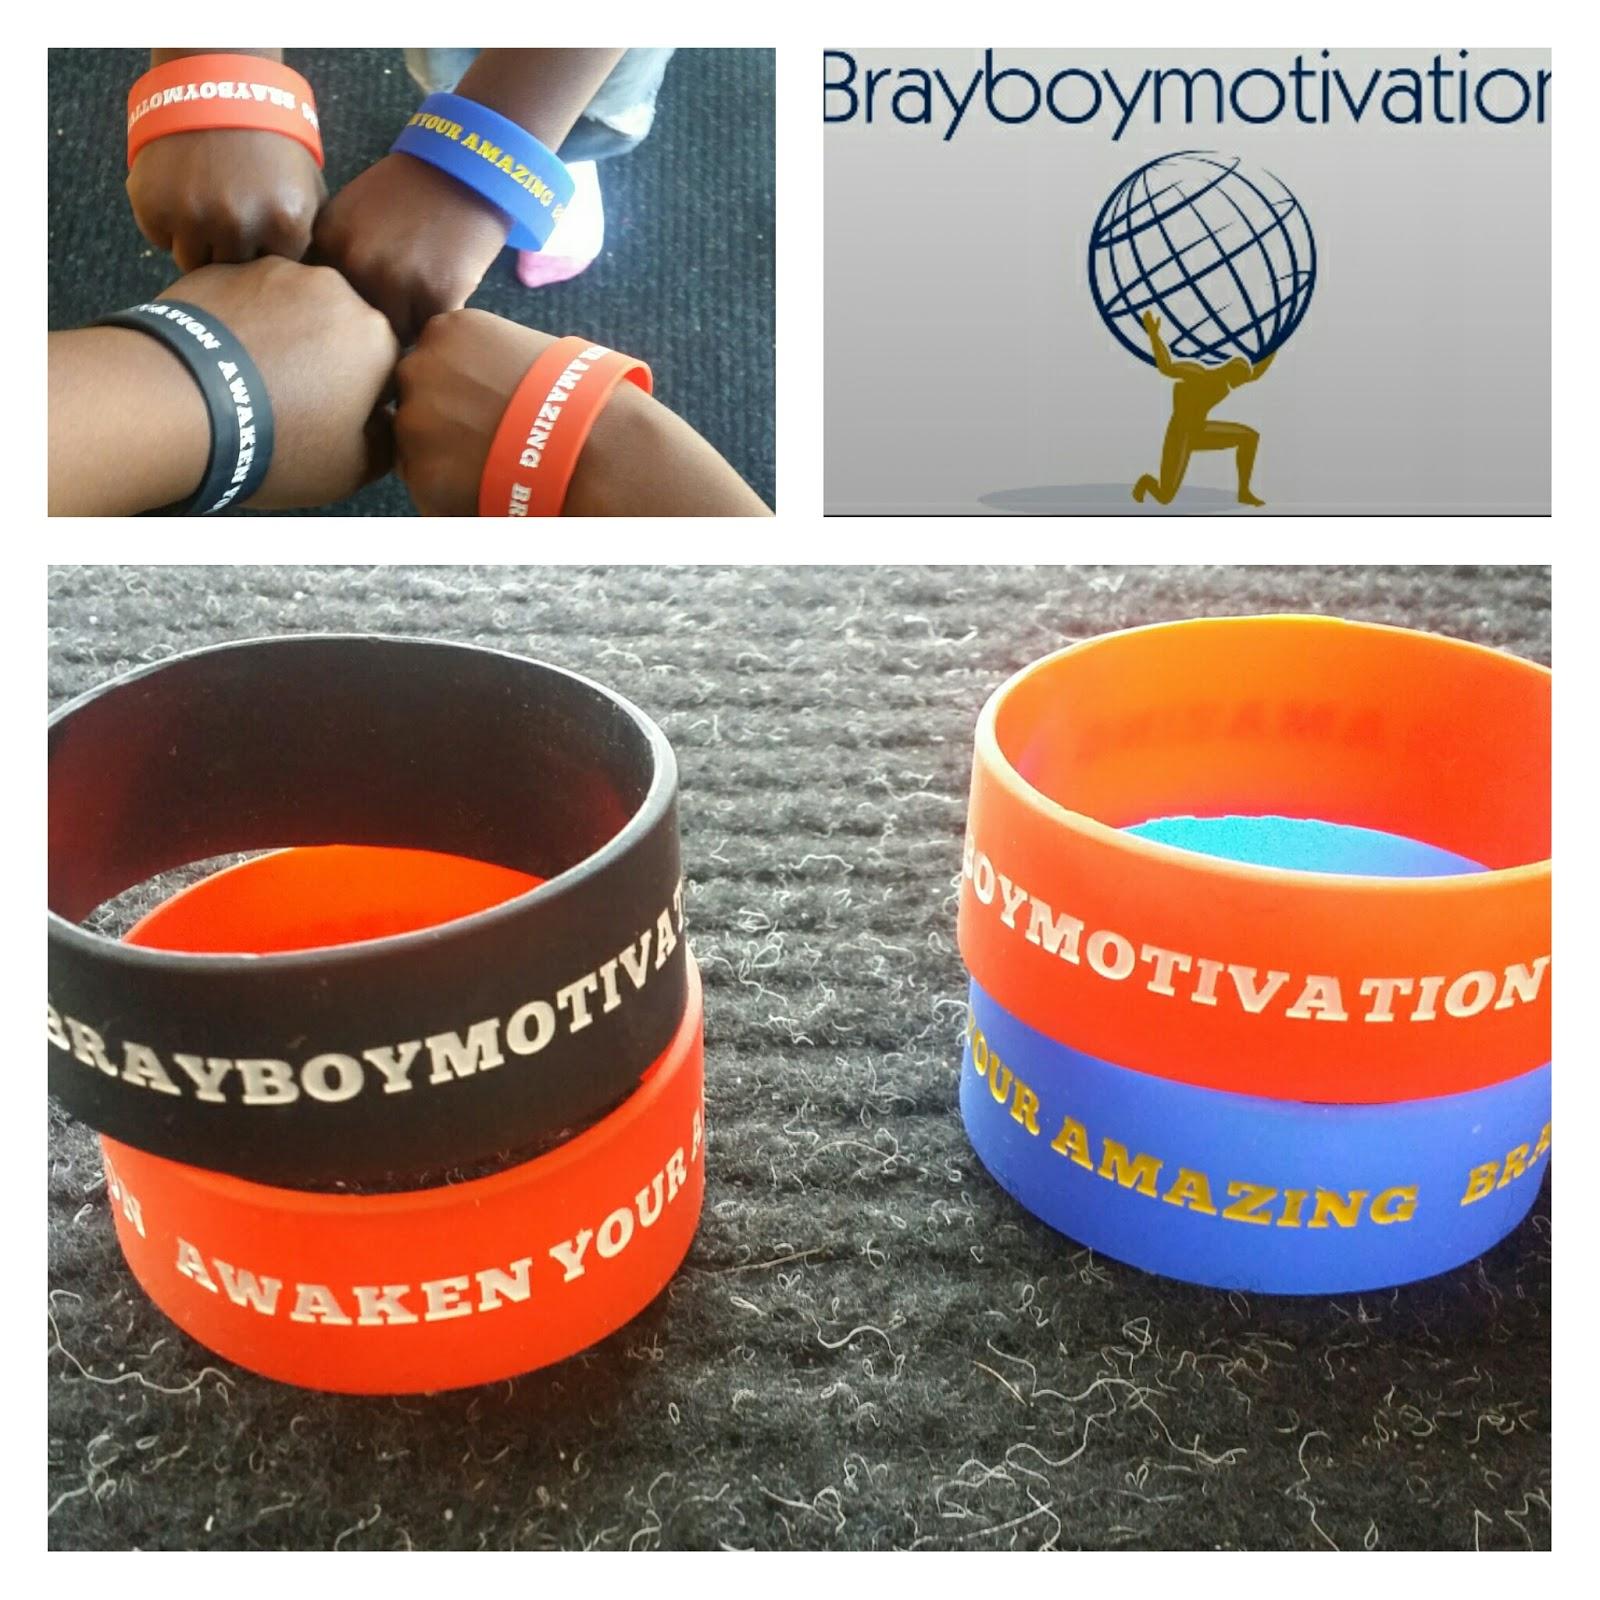 Brayboymotivation Awaken Your Amazing Free Bracelets In The Mail